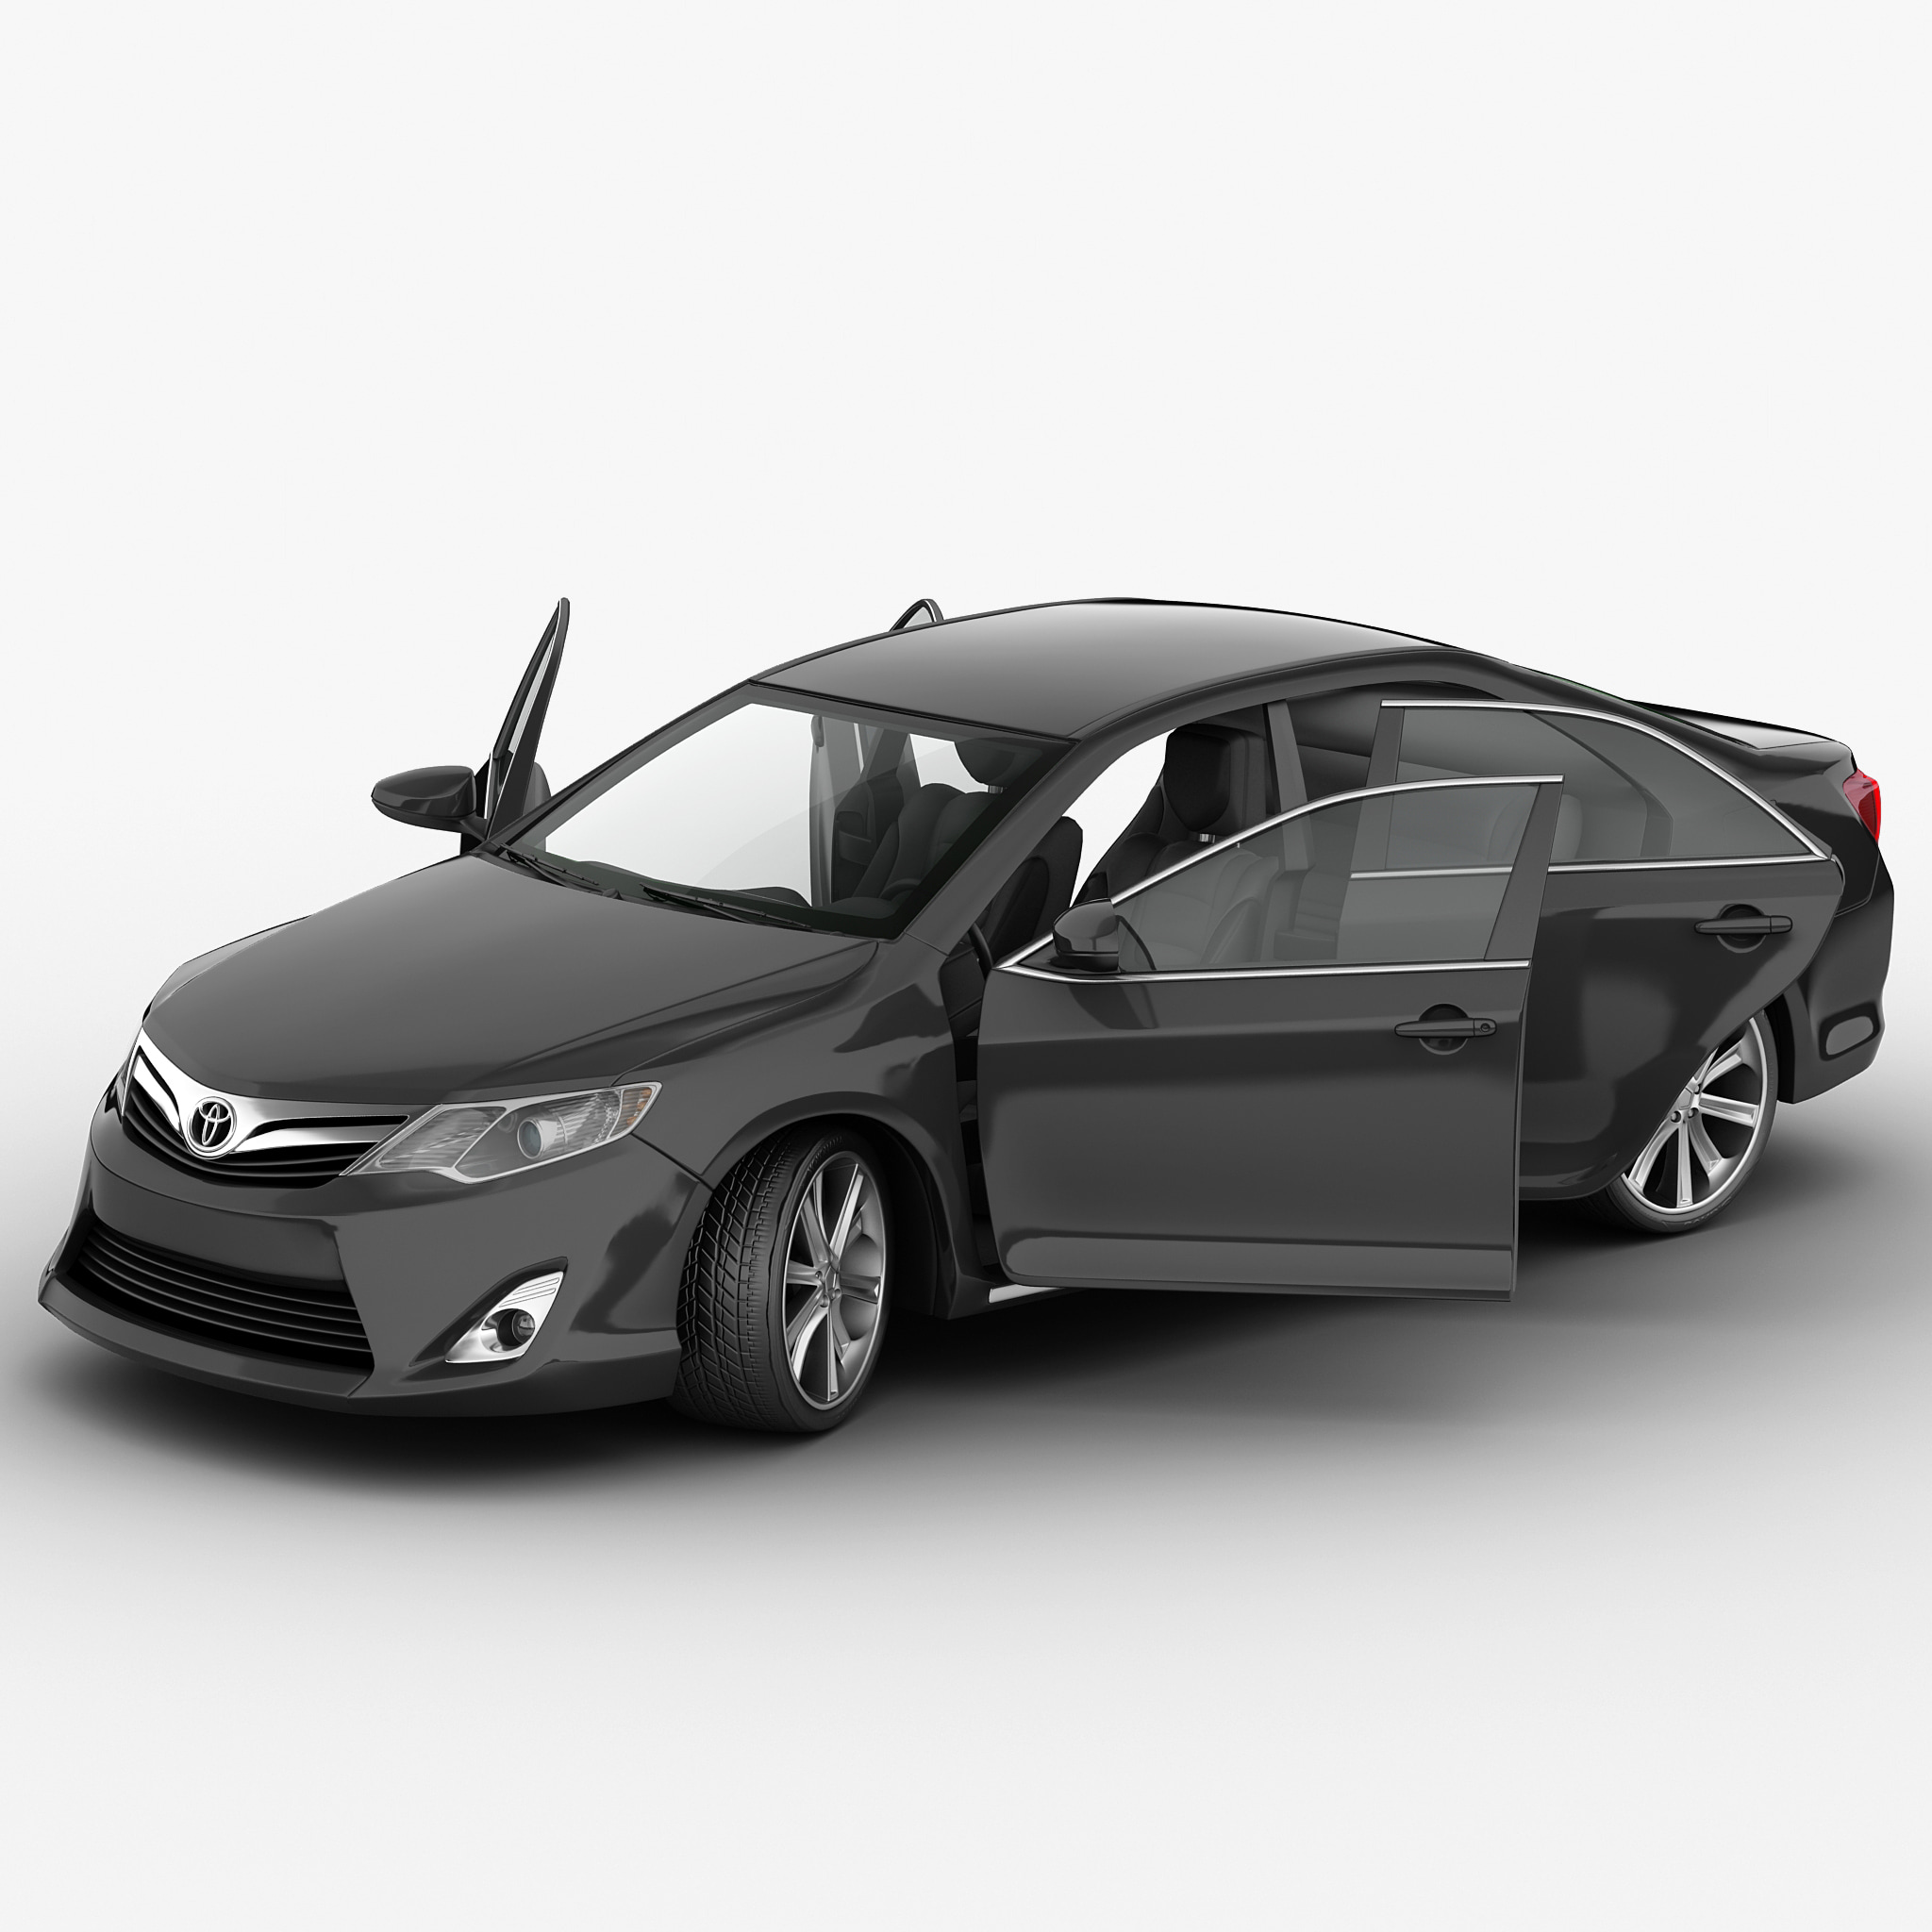 Toyota Camry 2012 Rigged_5.jpg